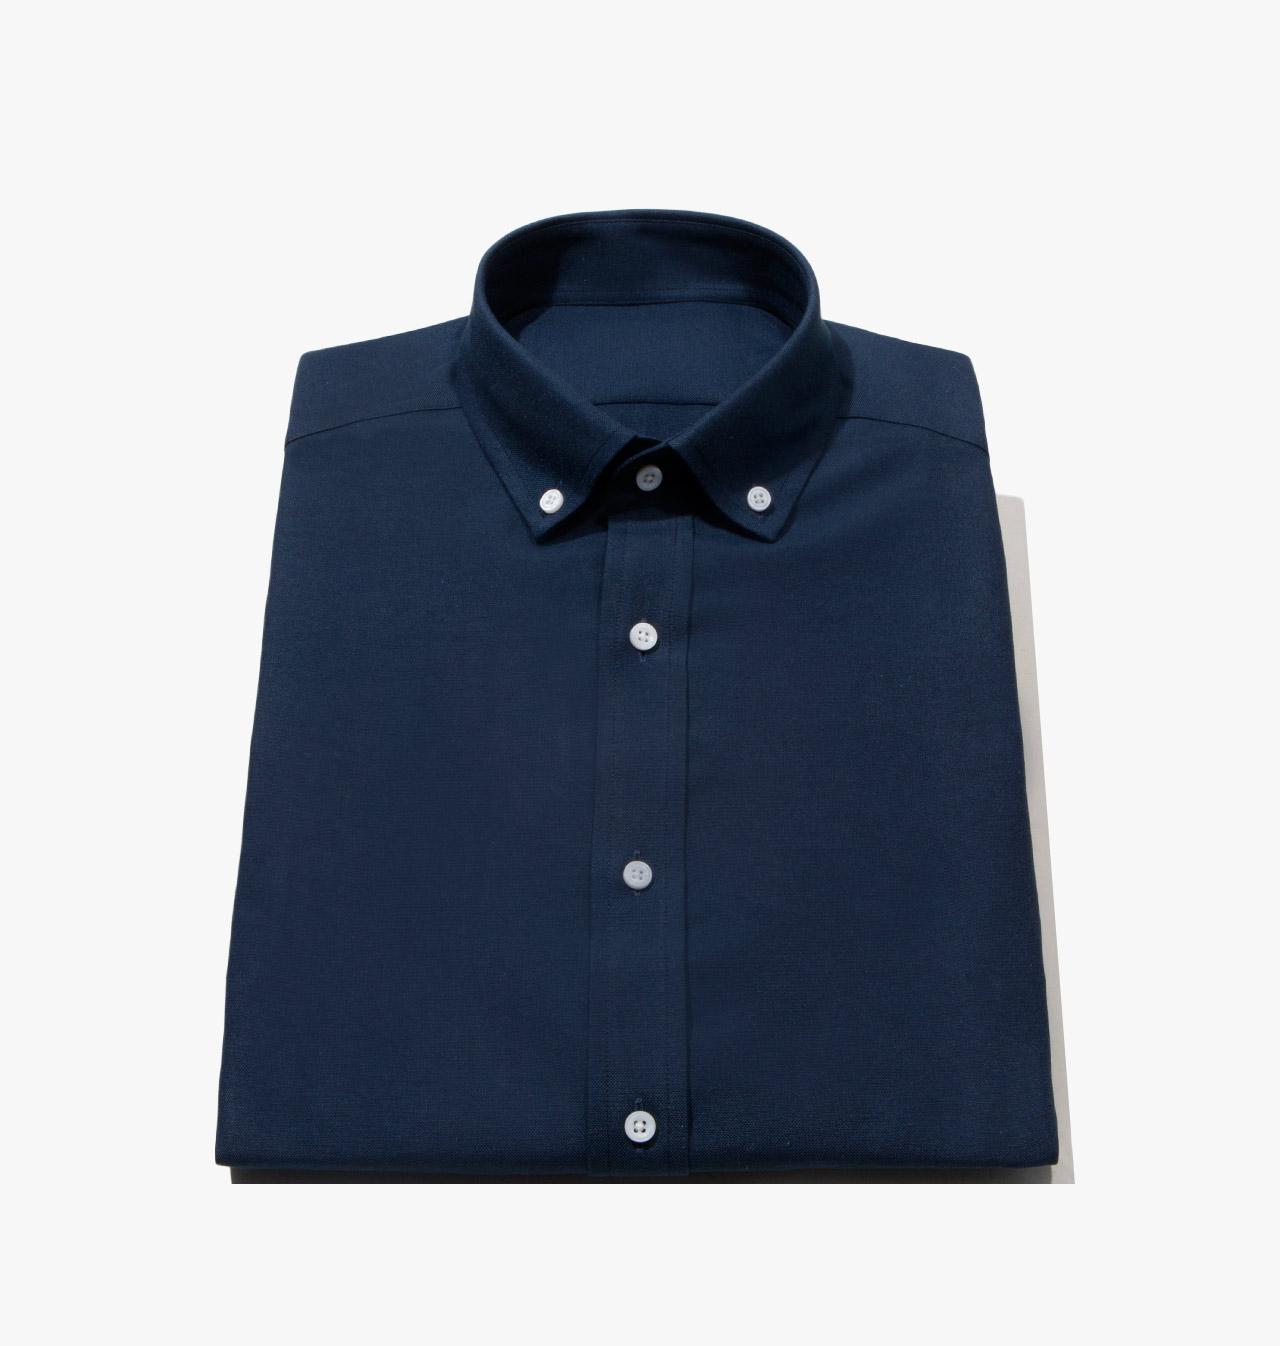 Mens Custom Made Navy Oxford Dress Shirt 1452